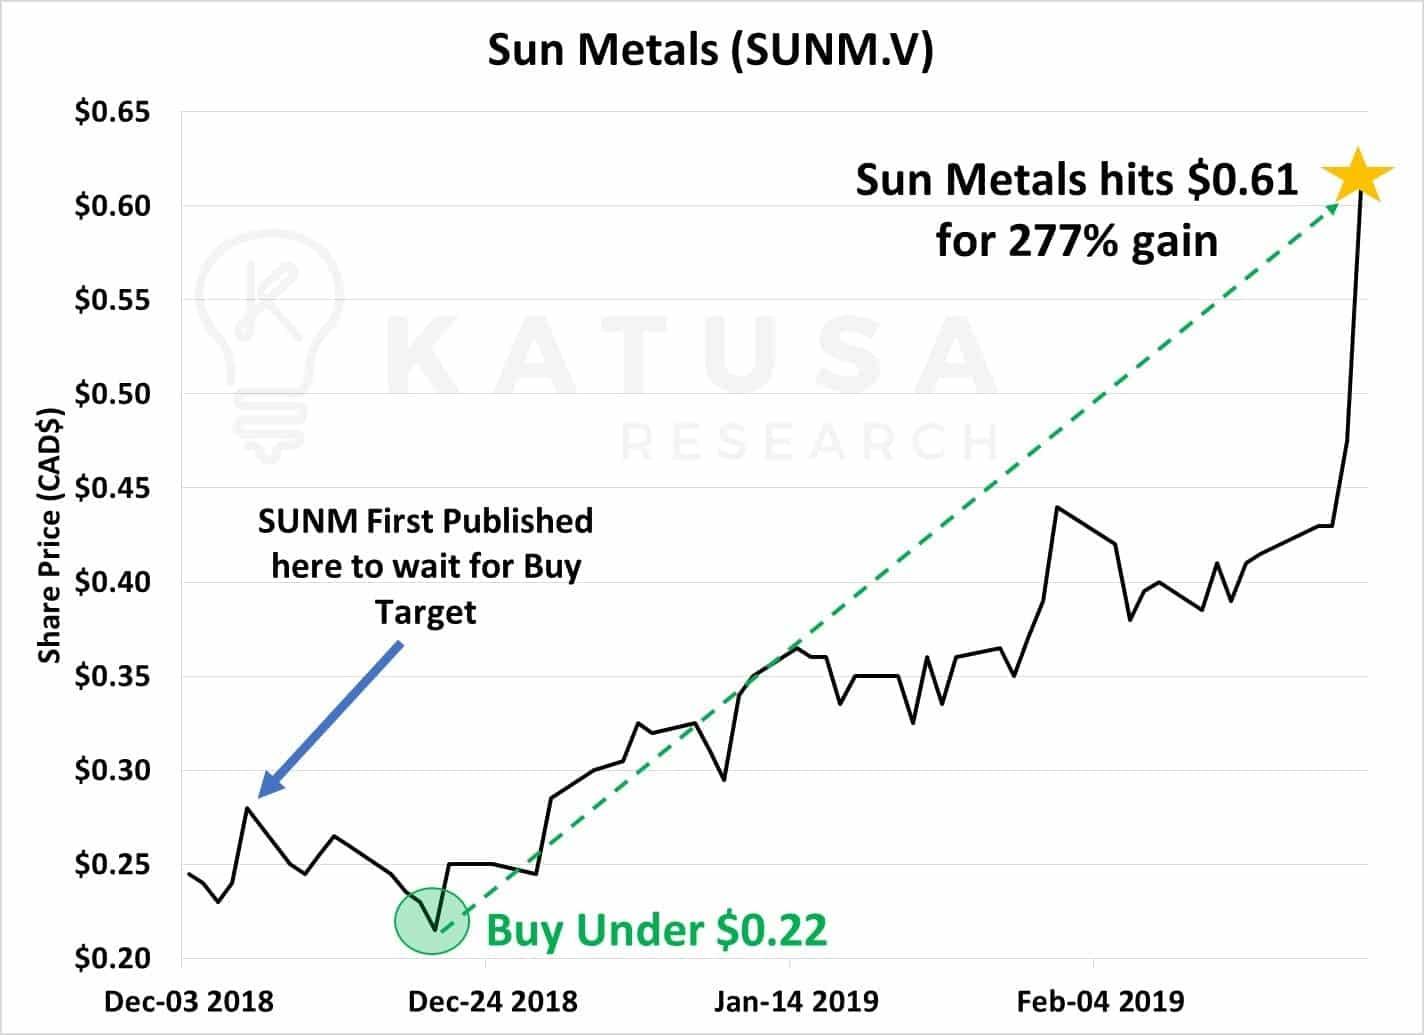 Alligator Investing - Way of the Alligator Sun Metals